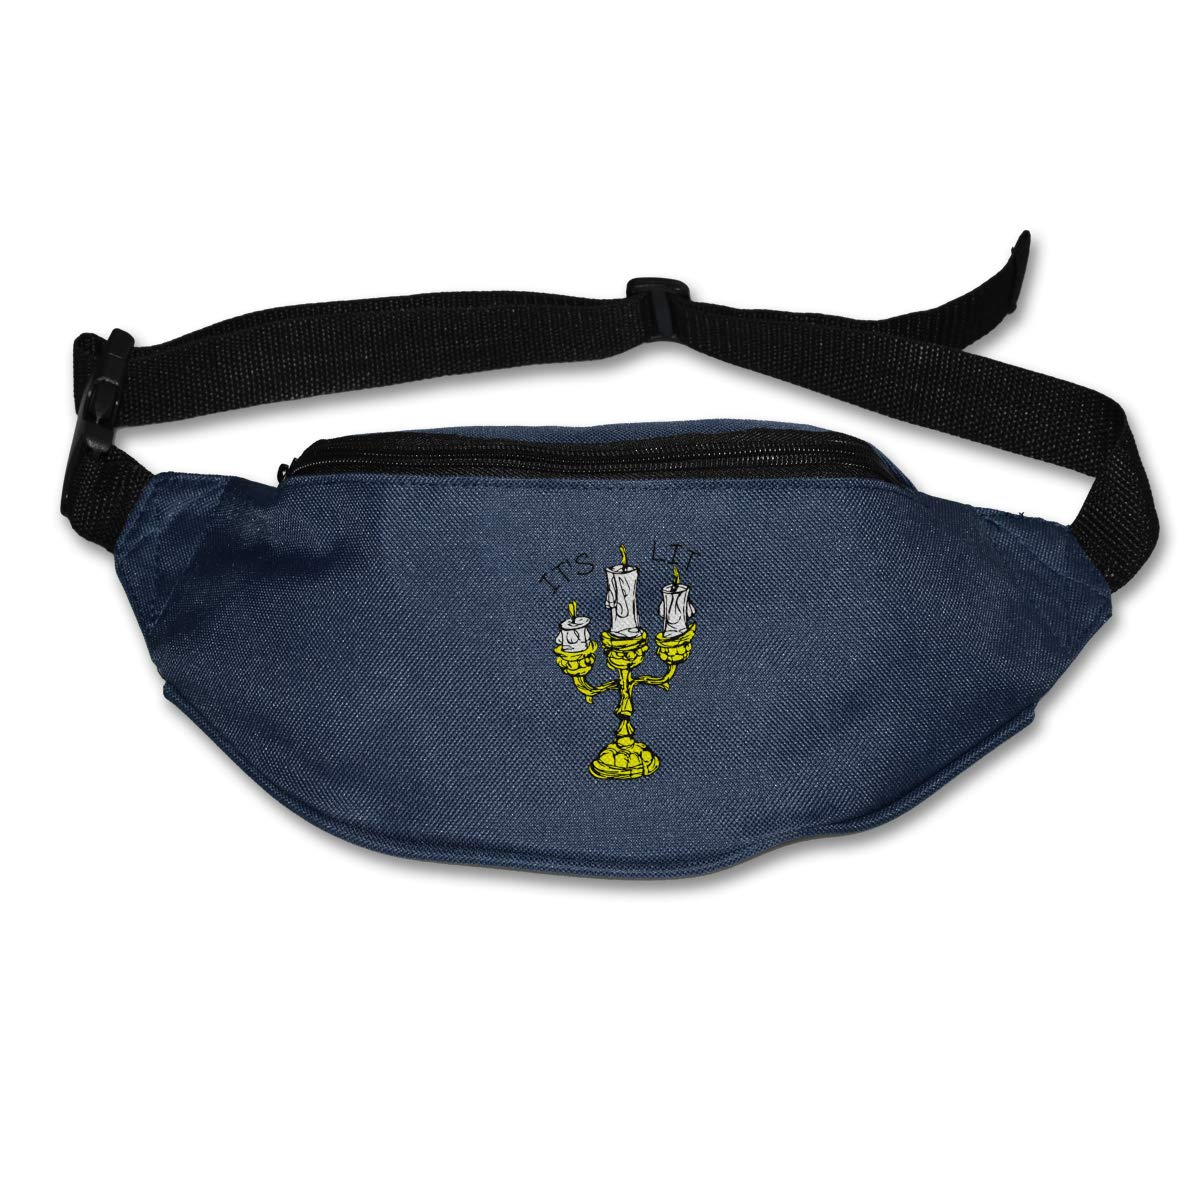 Sport Waist Packs Fanny Pack Adjustable For Run lamp Its Lit